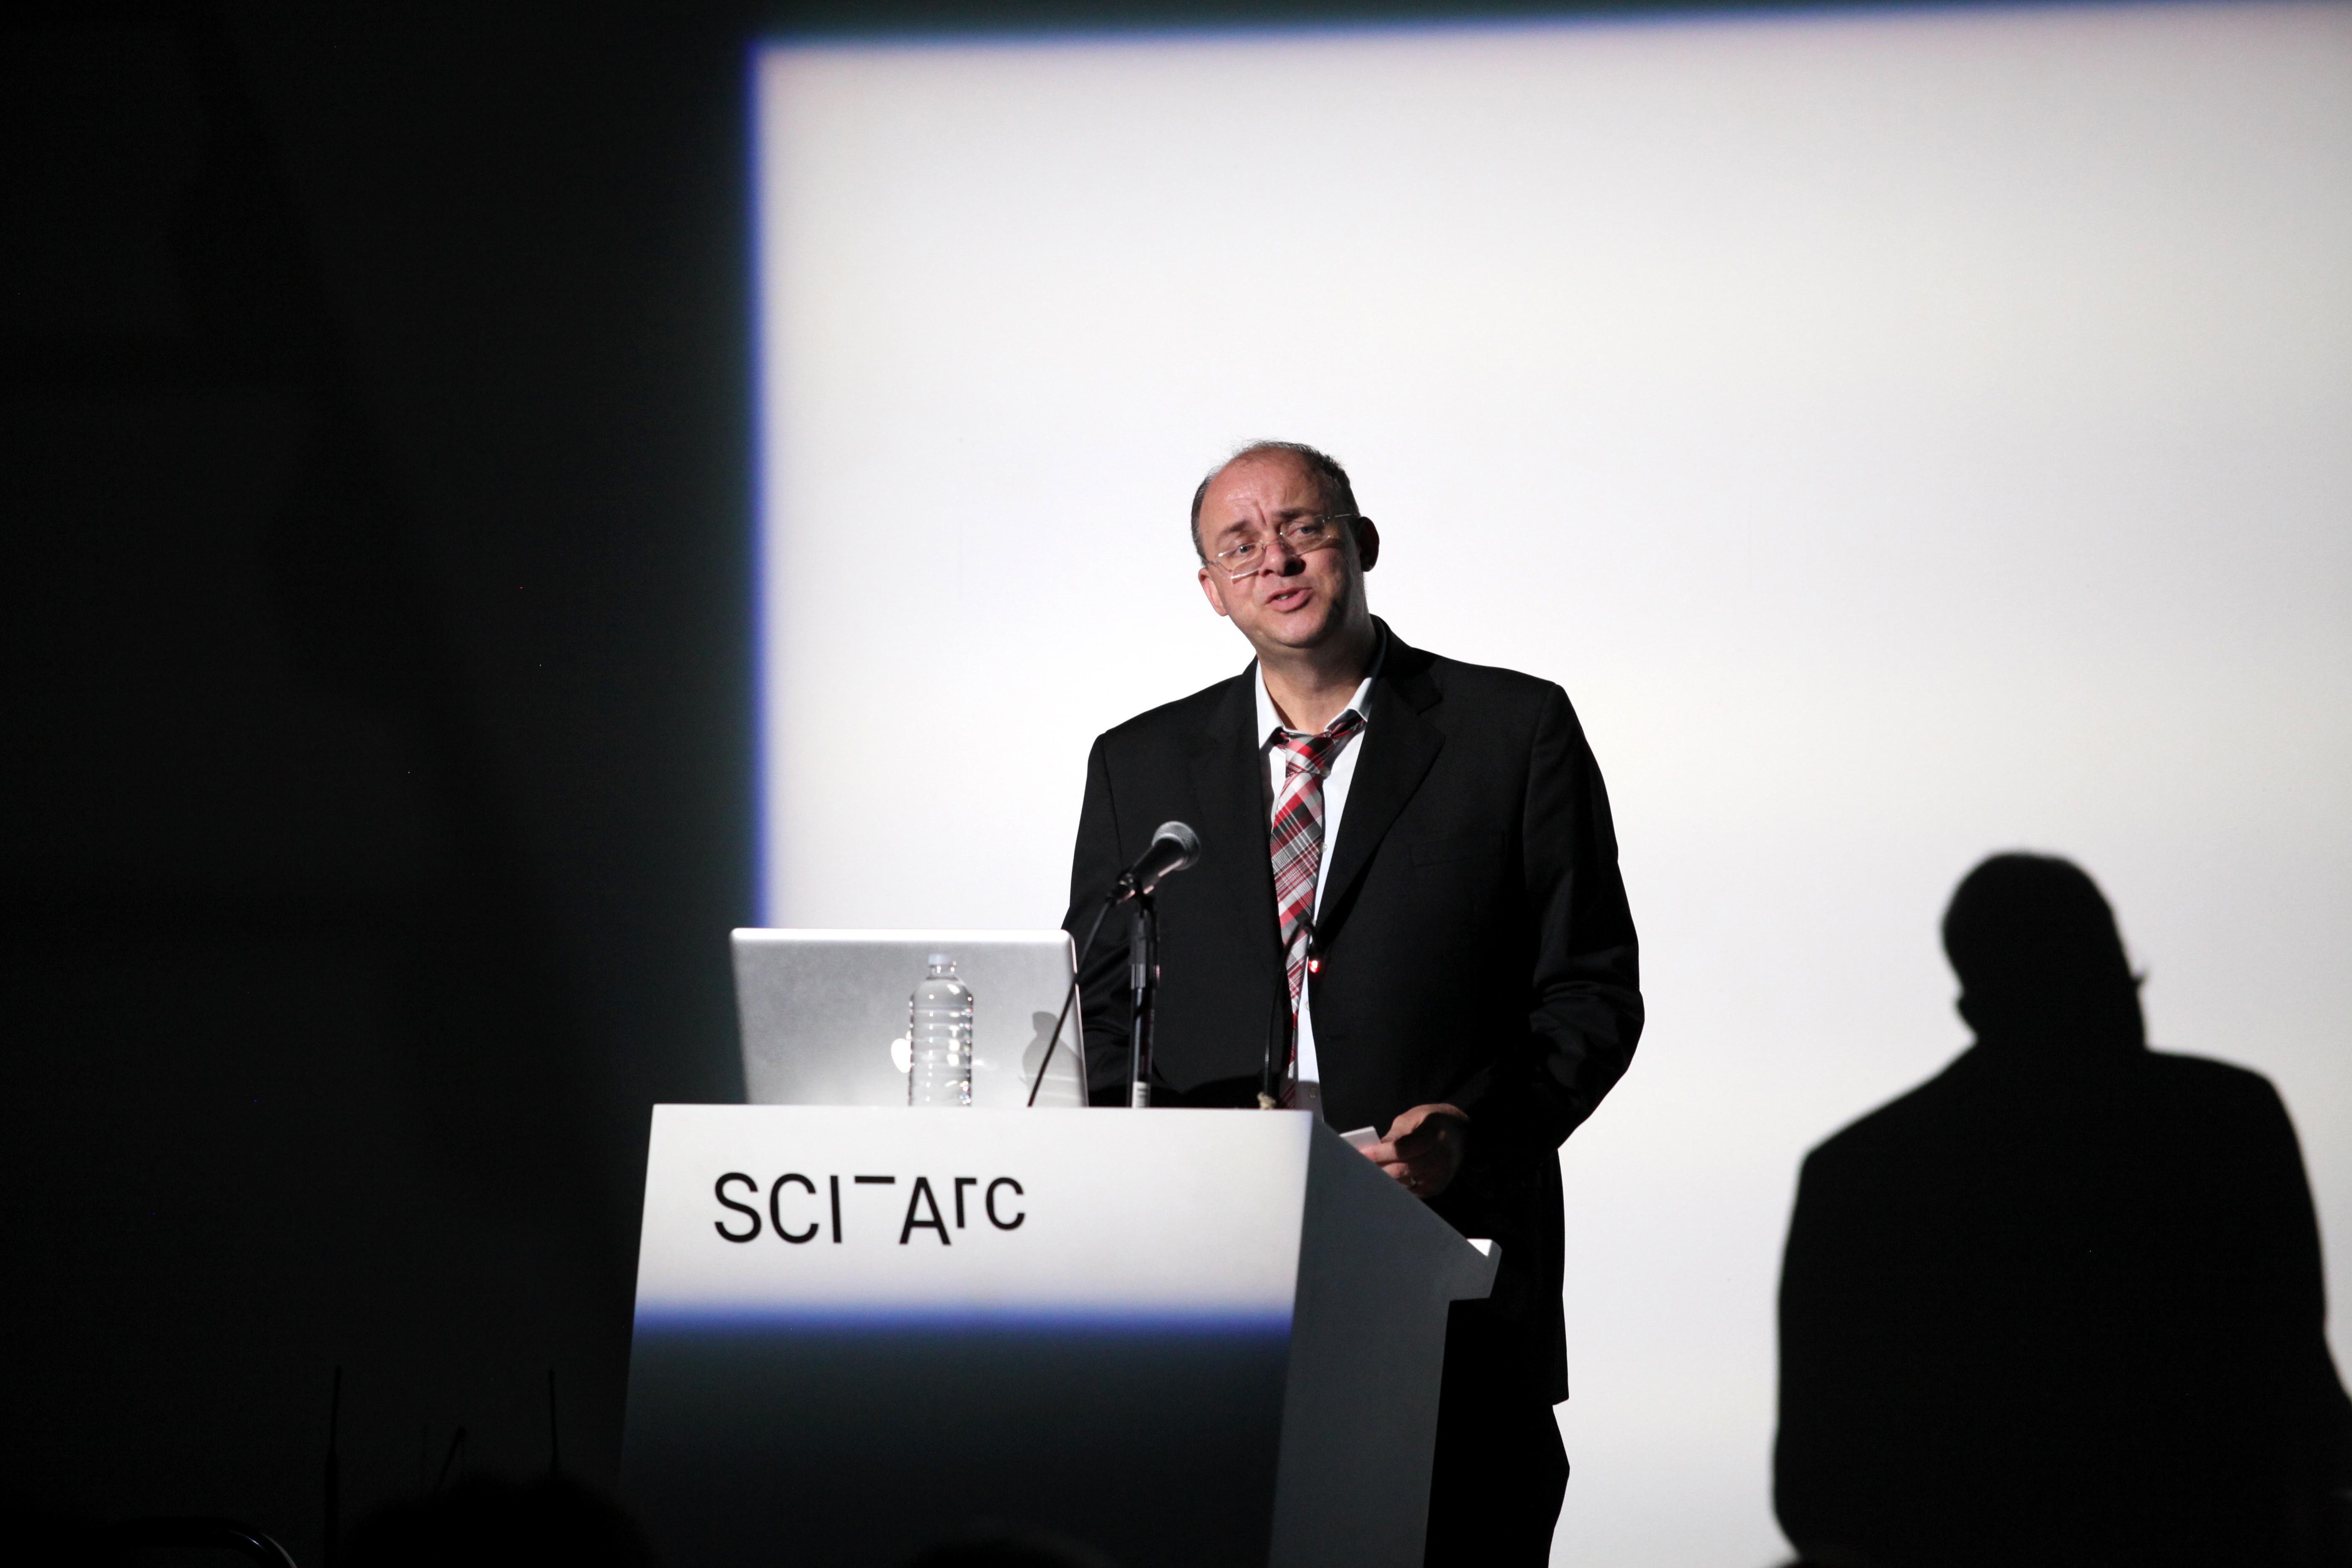 Graham Harman giving a talk